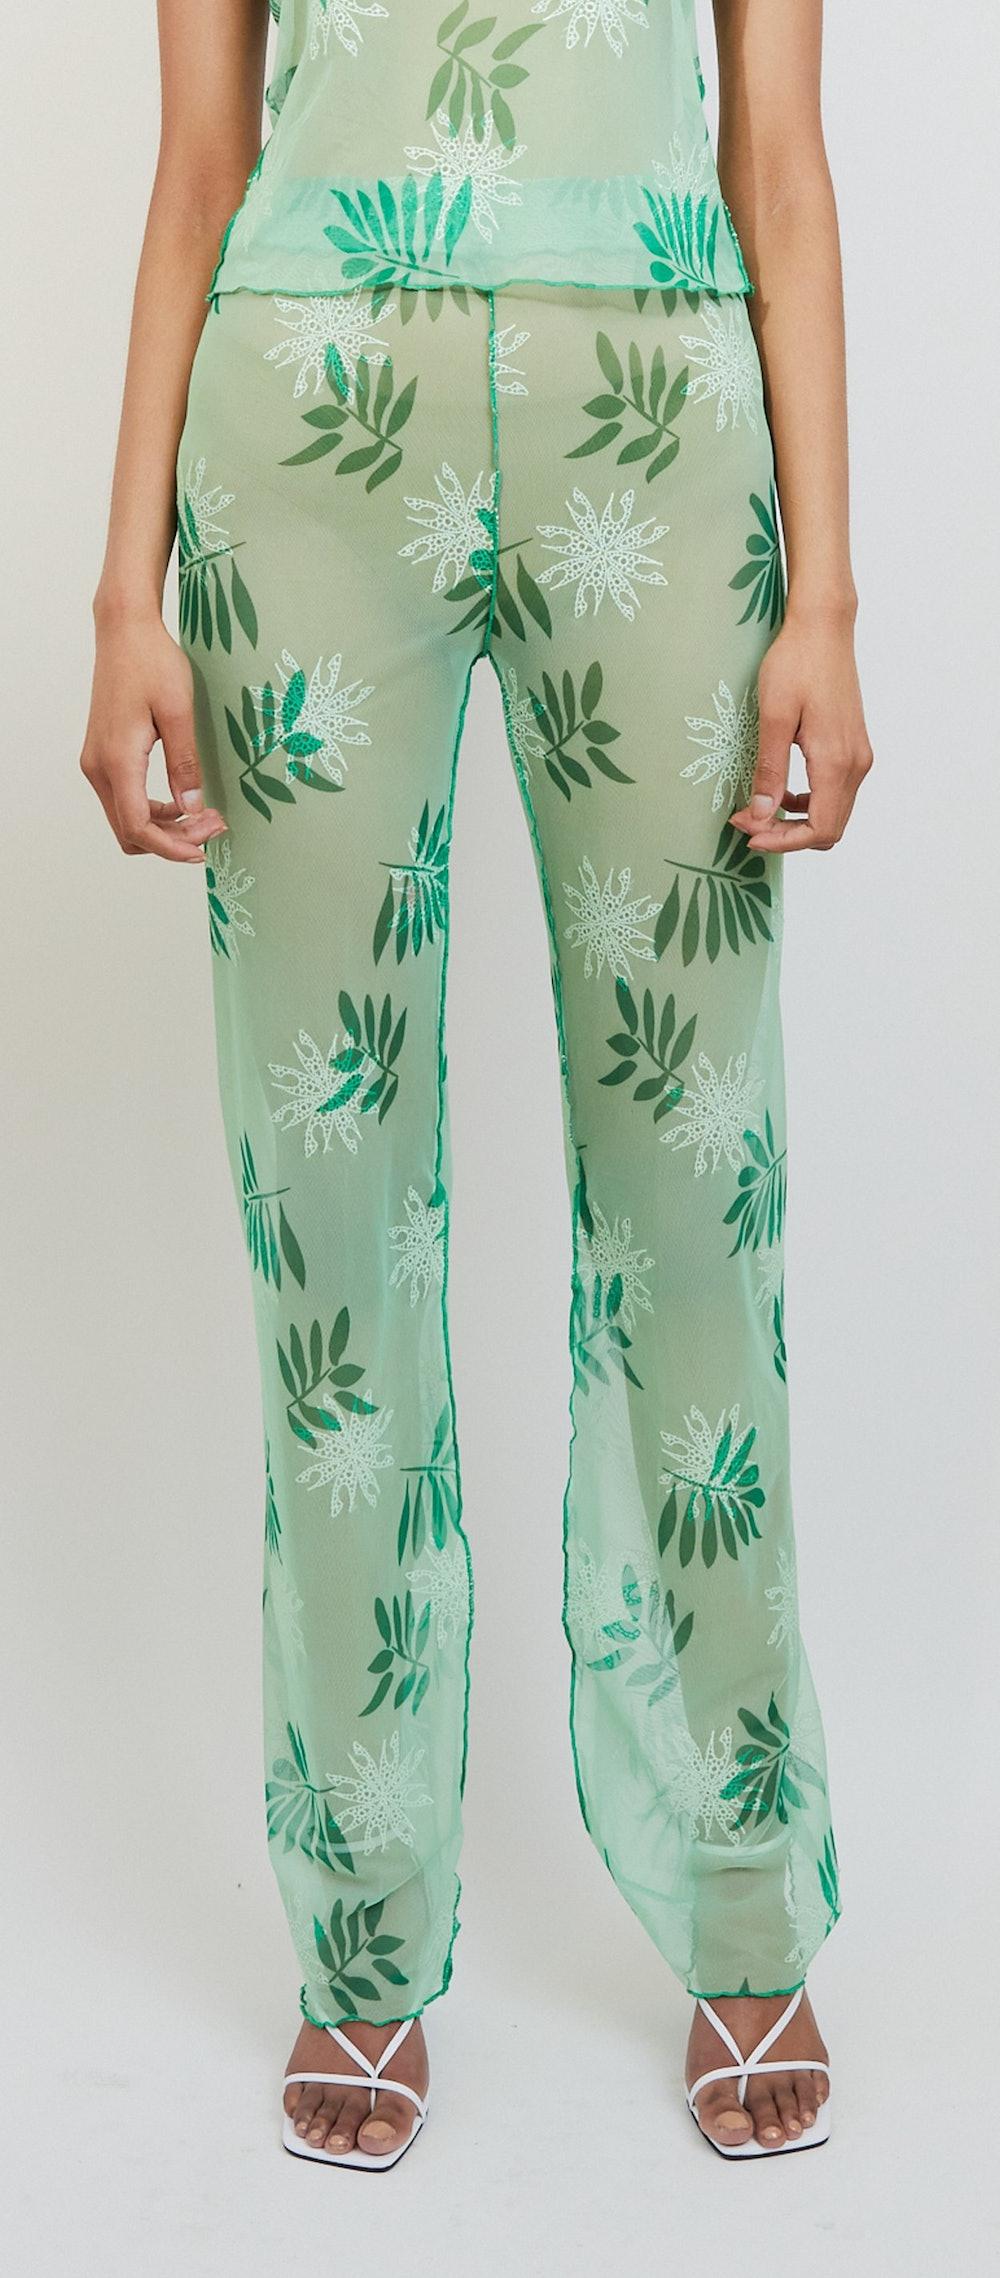 Sheer Plant Print Mesh Pants